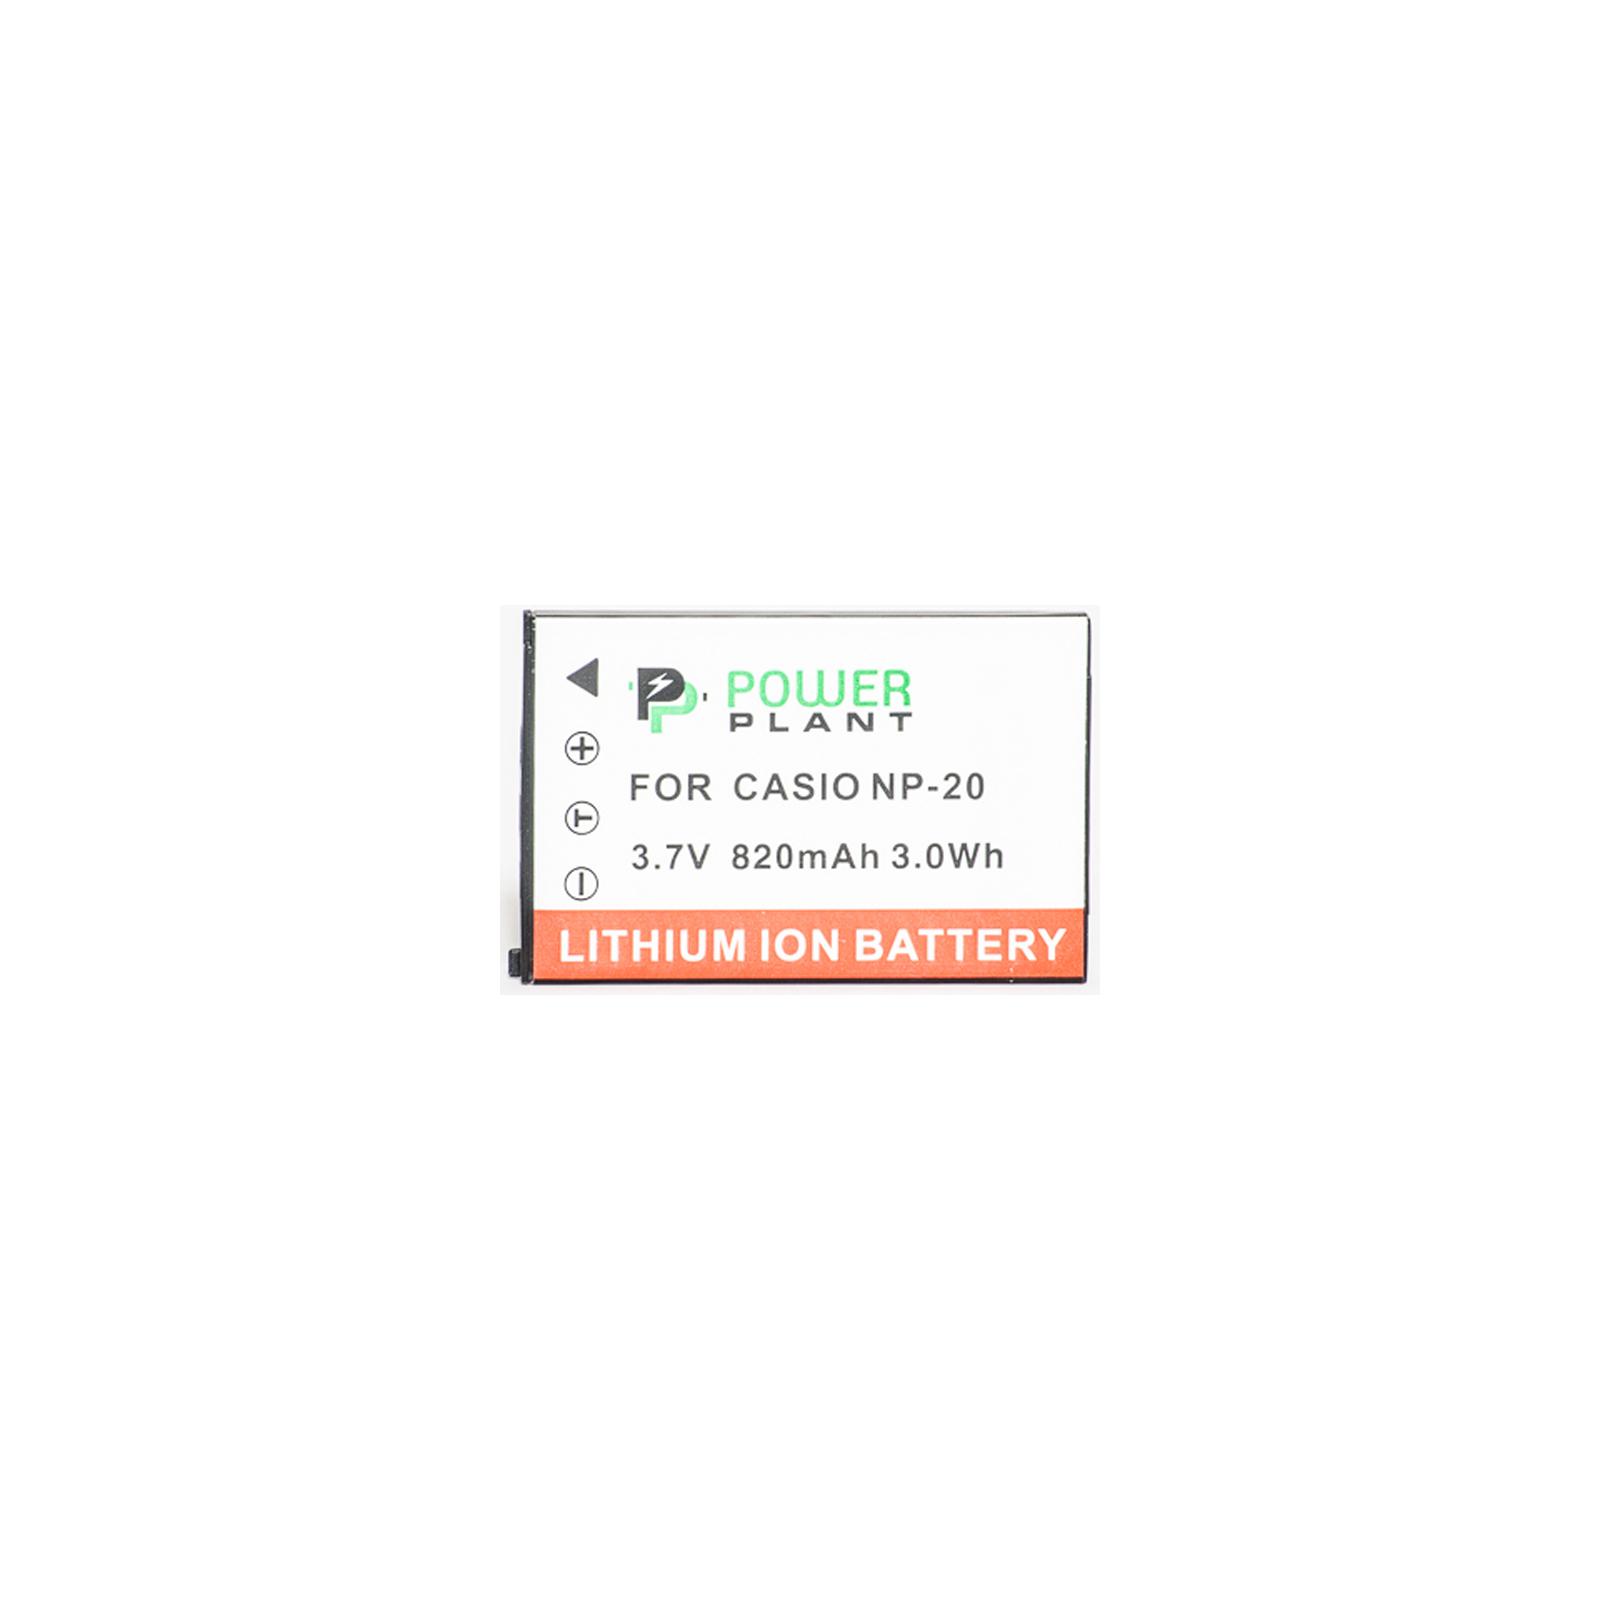 Аккумулятор к фото/видео PowerPlant Casio NP-20 (DV00DV1042) изображение 2